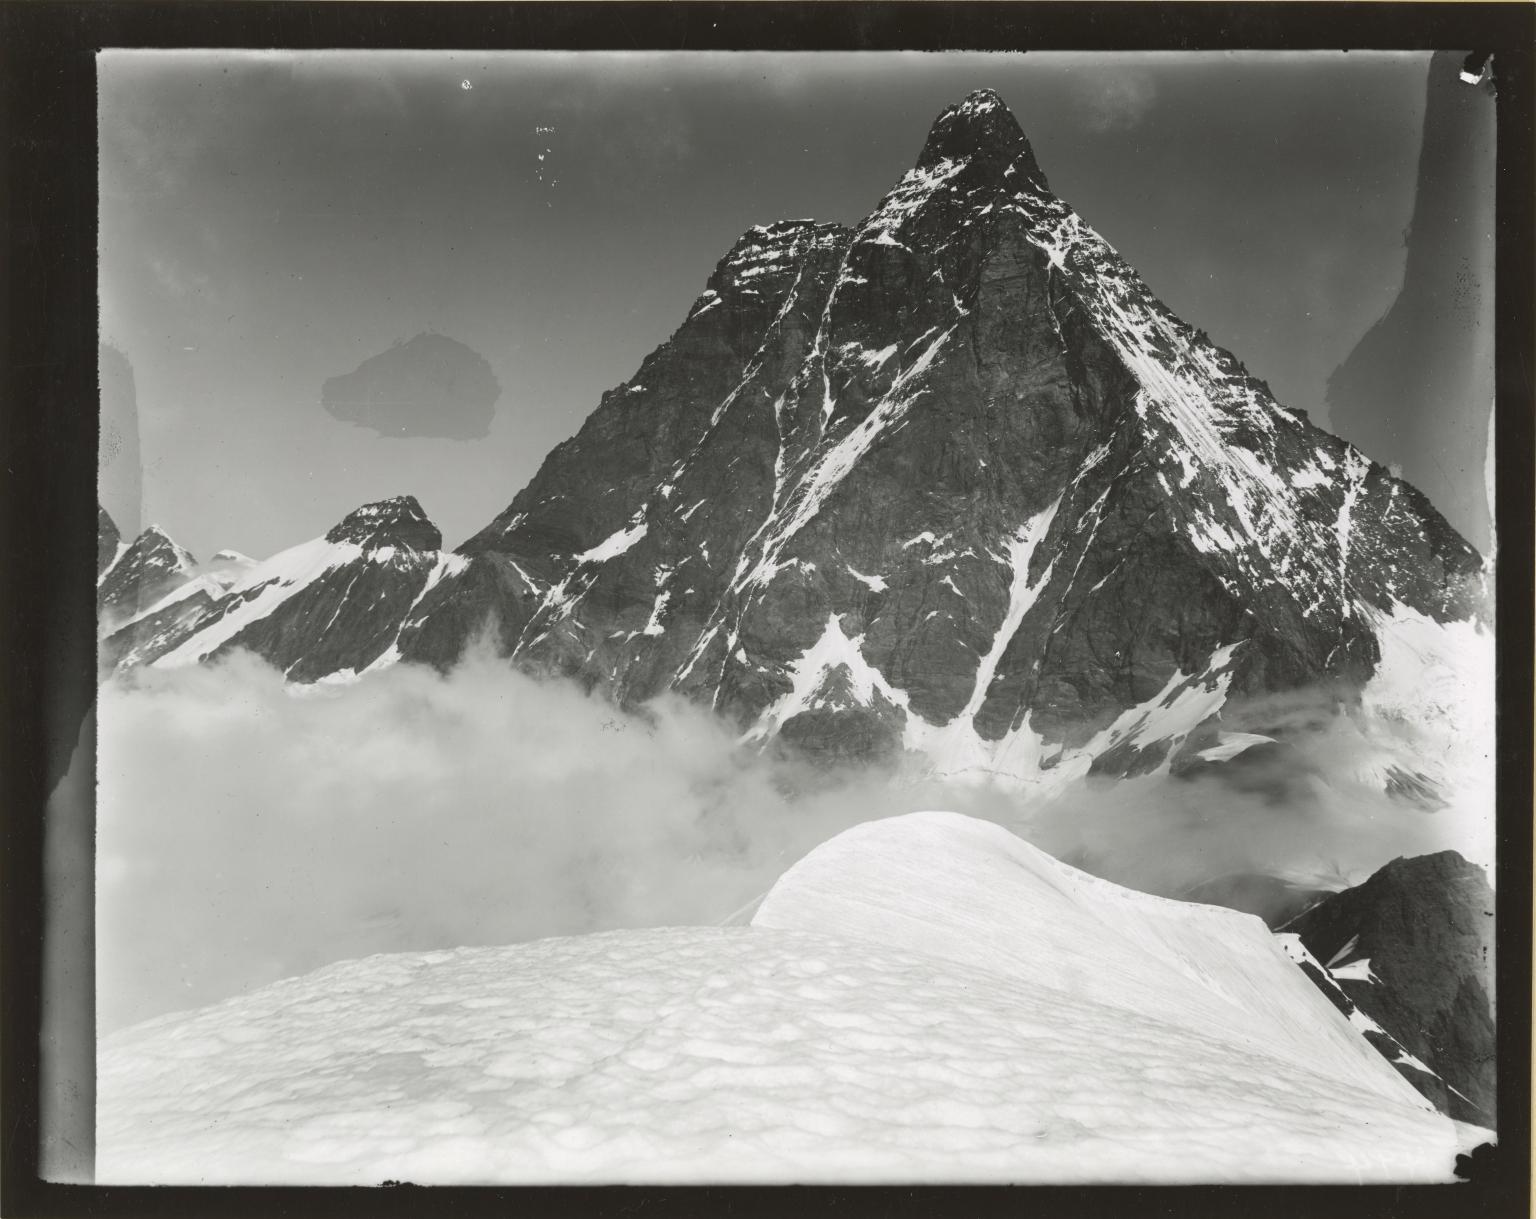 Matterhorn from Furggrat Ridge, Switzerland